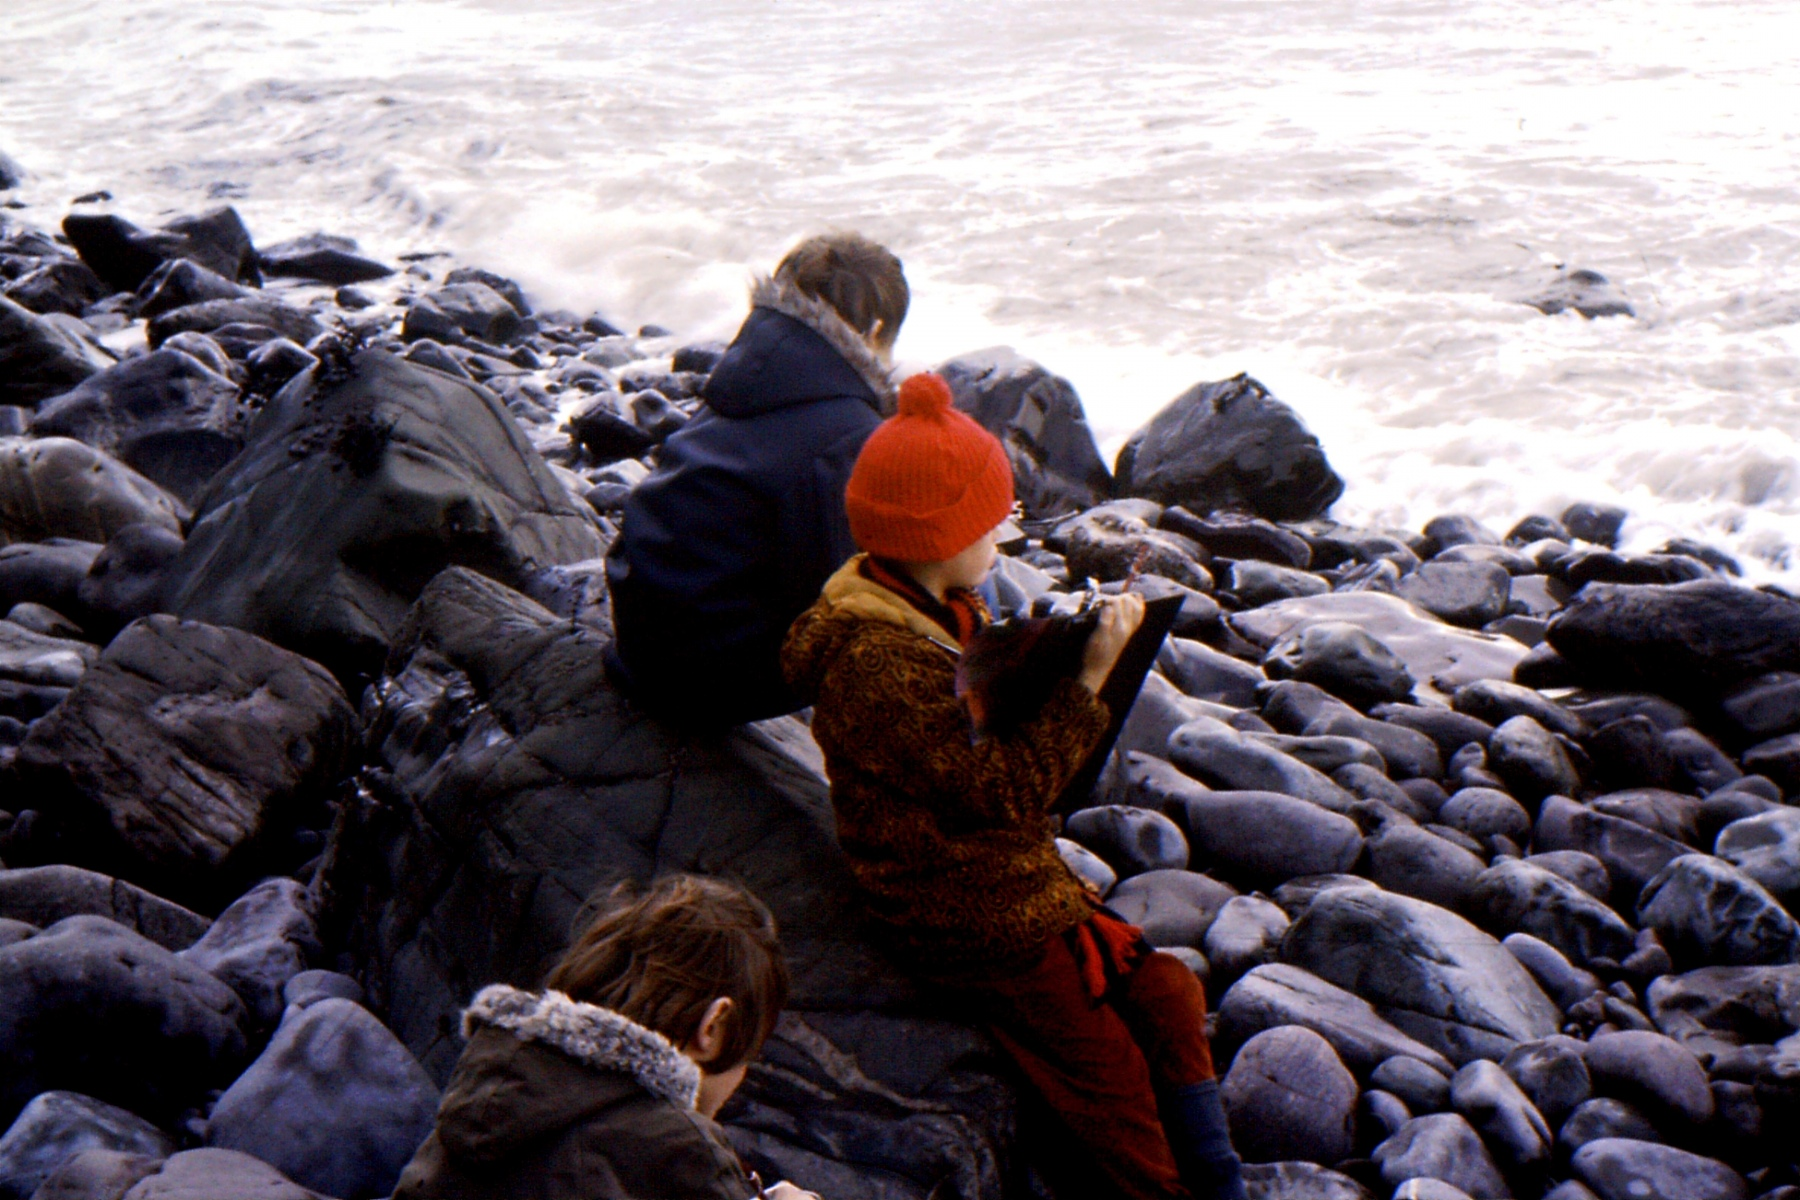 1966-69 Middle Barton School - Field trip to Yenworthy, Somerset - on the beach.